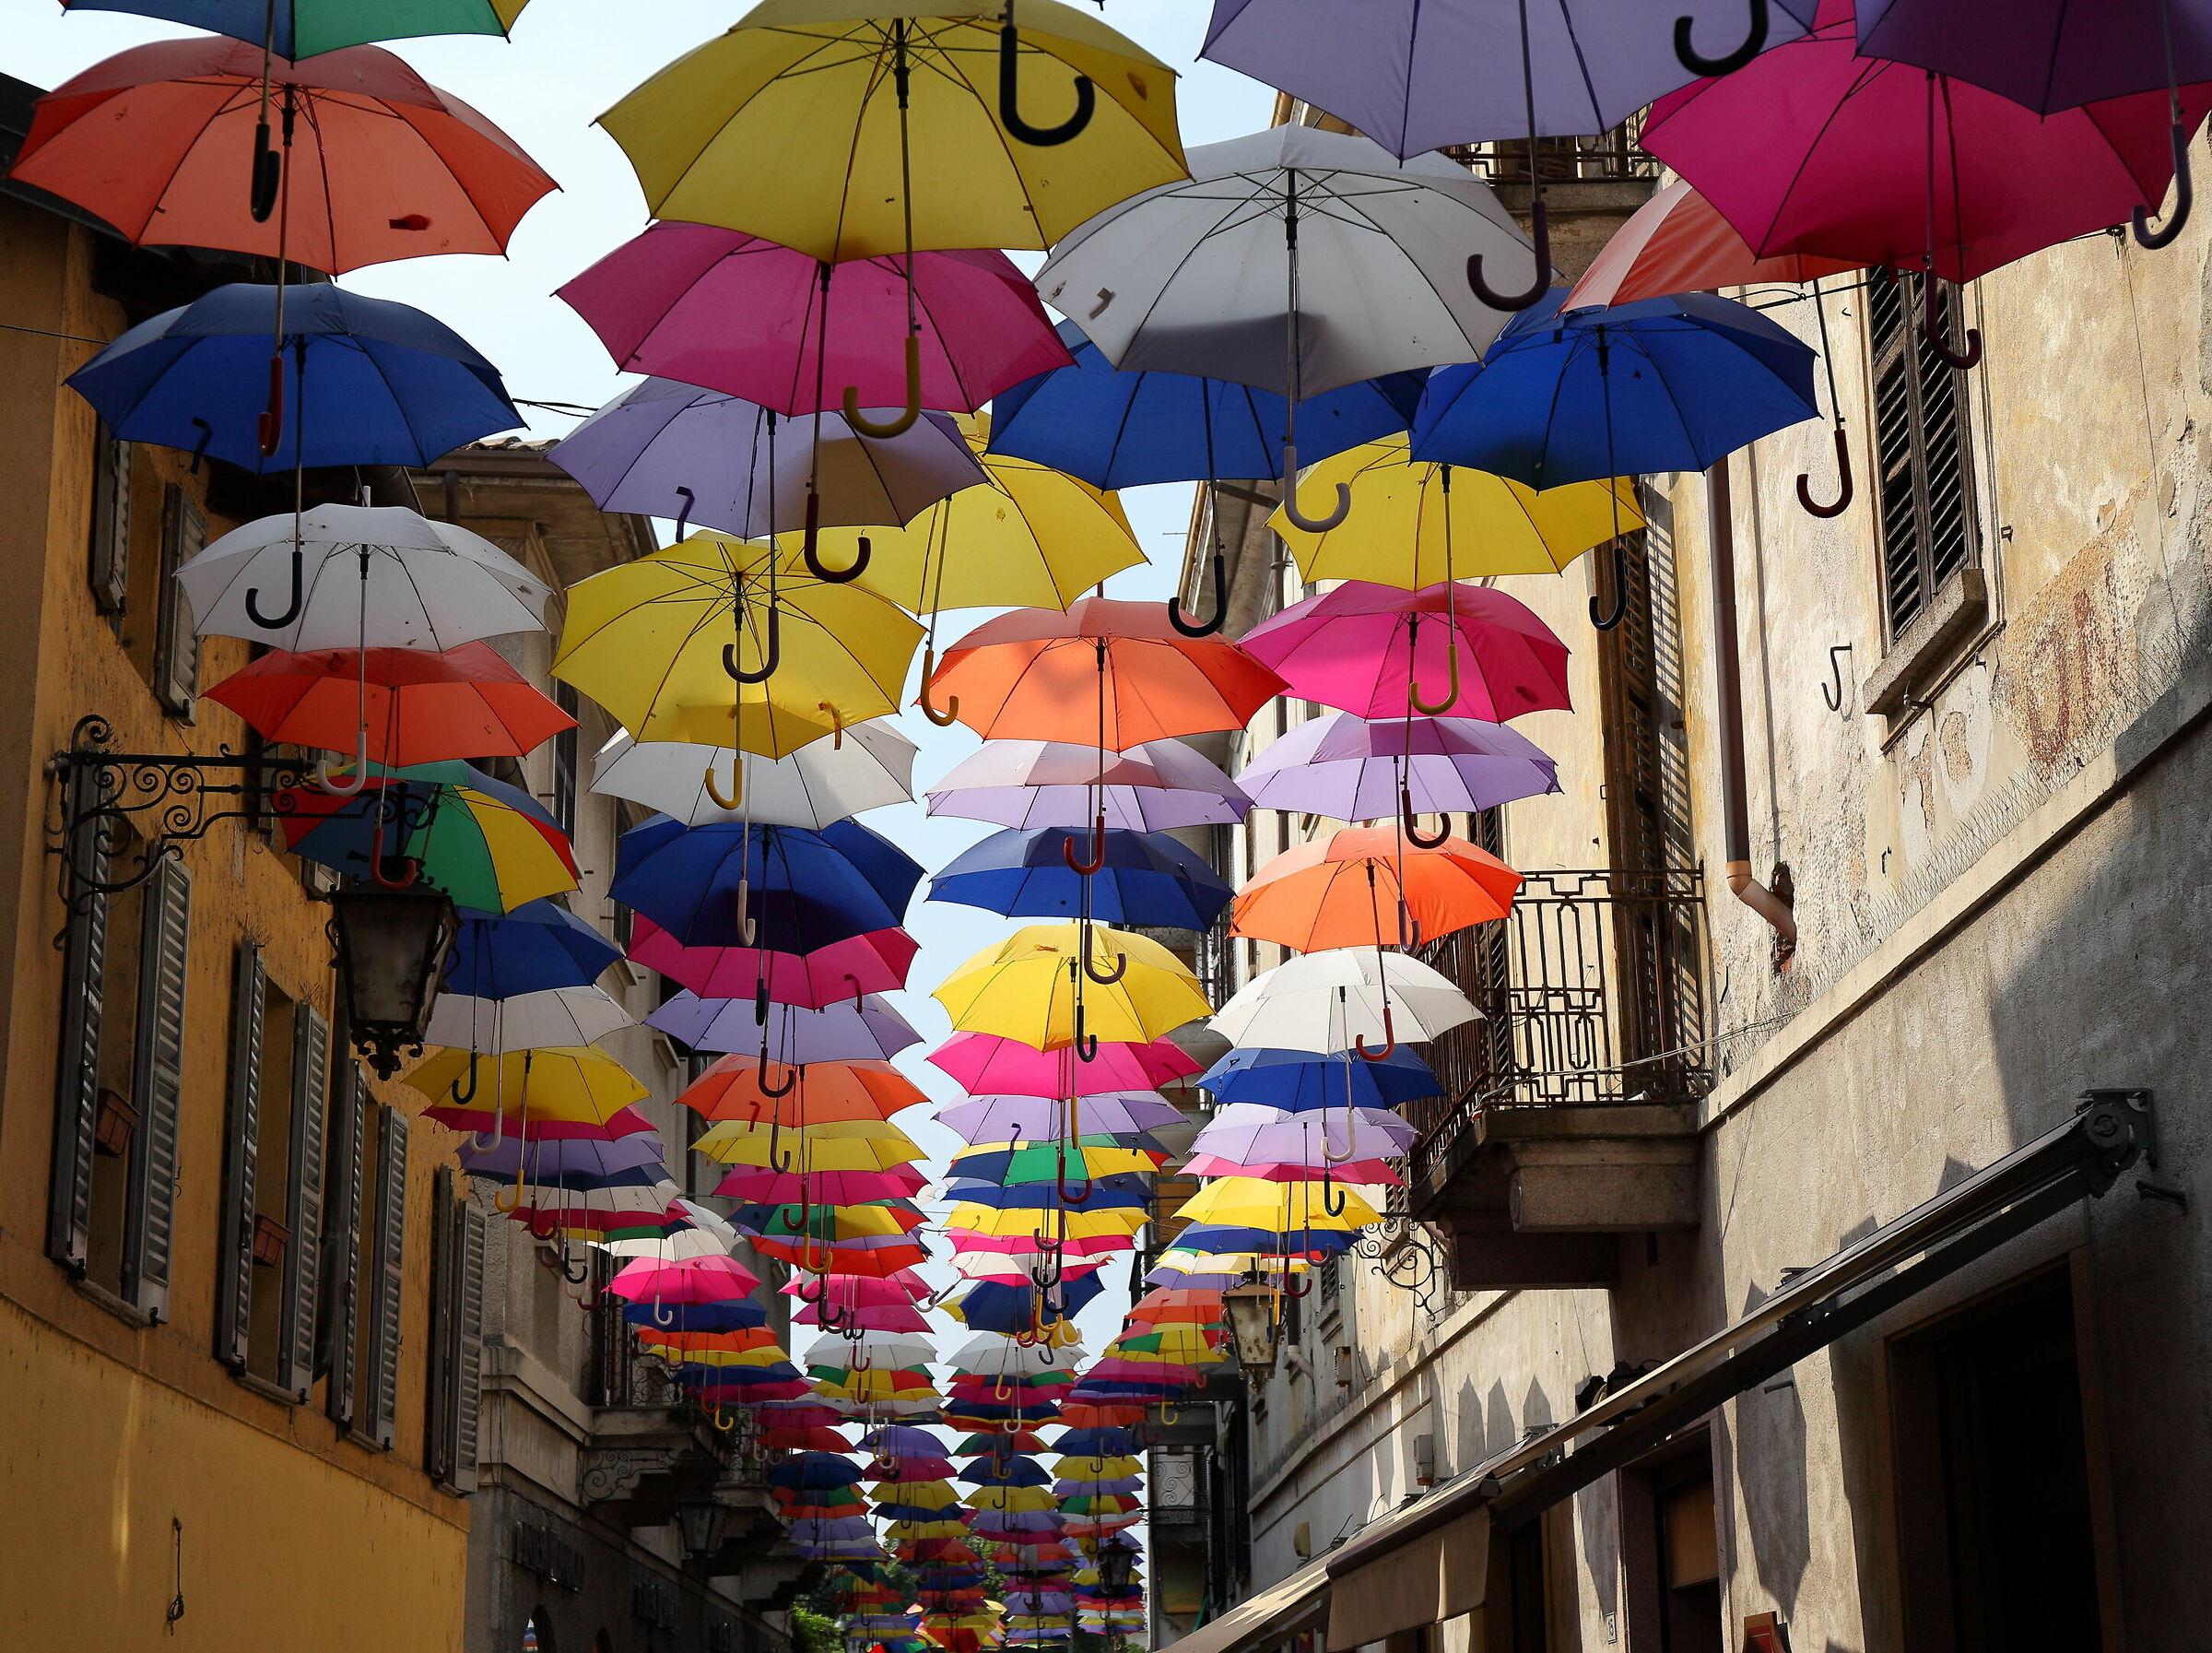 Flying umbrellas in Arona...